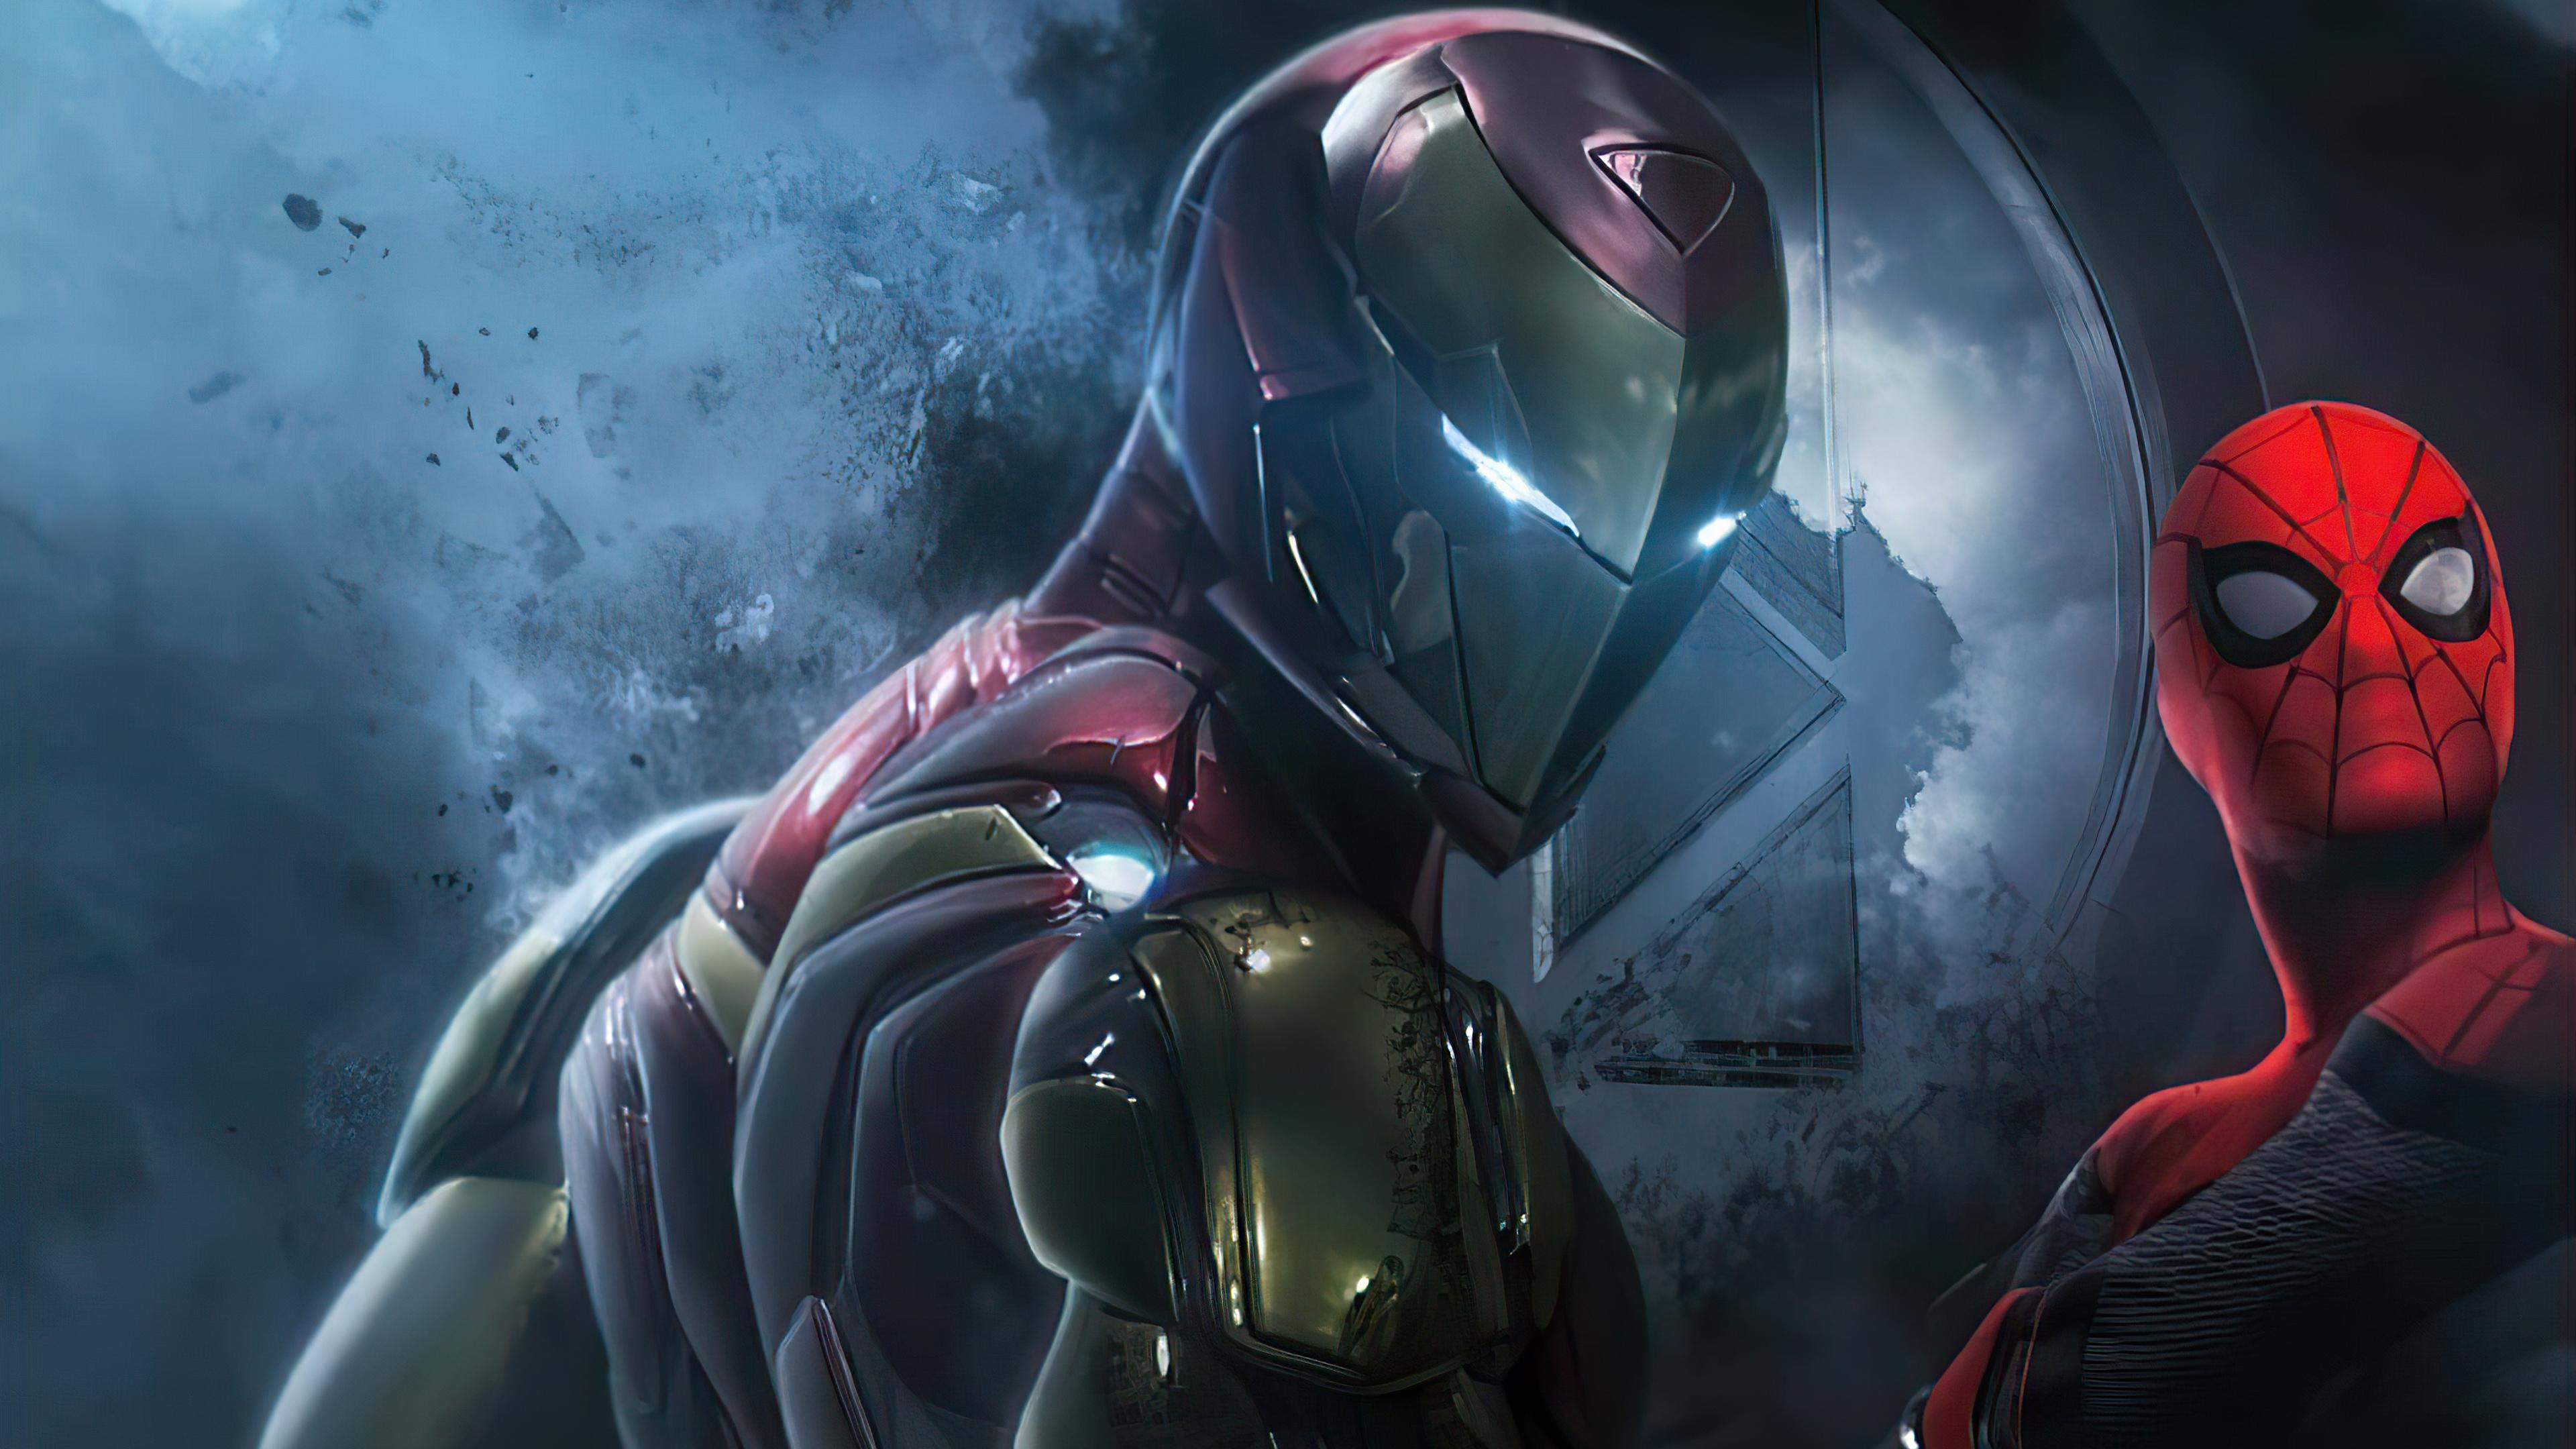 iron man and spider 4k 1619215238 - Iron Man And Spider 4k - Iron Man And Spider 4k wallpapers